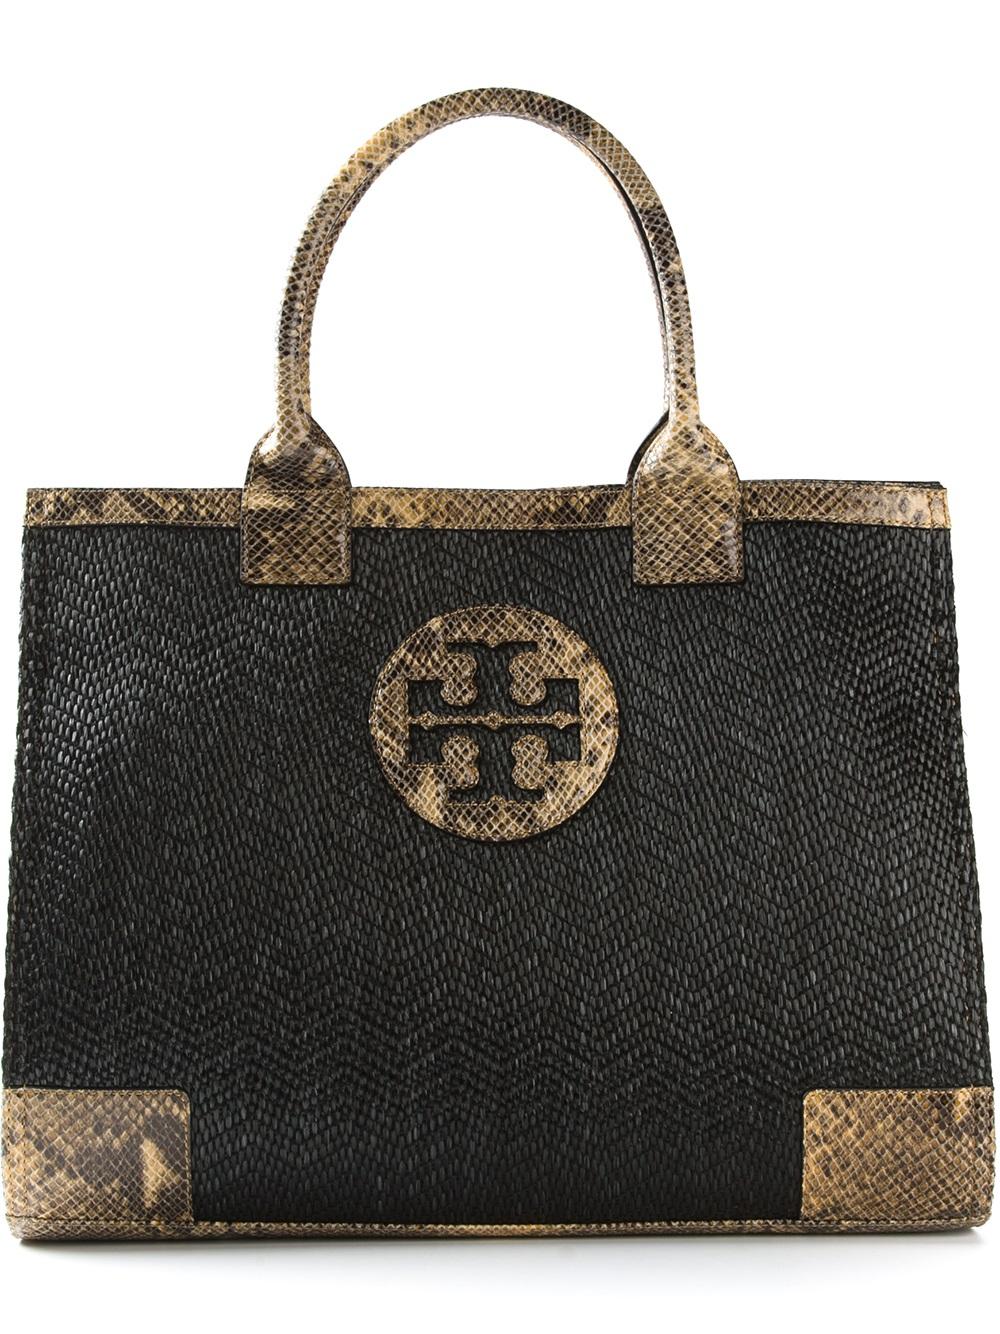 Tory Burch Ella Mini Tote Black Black Tote Handbags Lyst